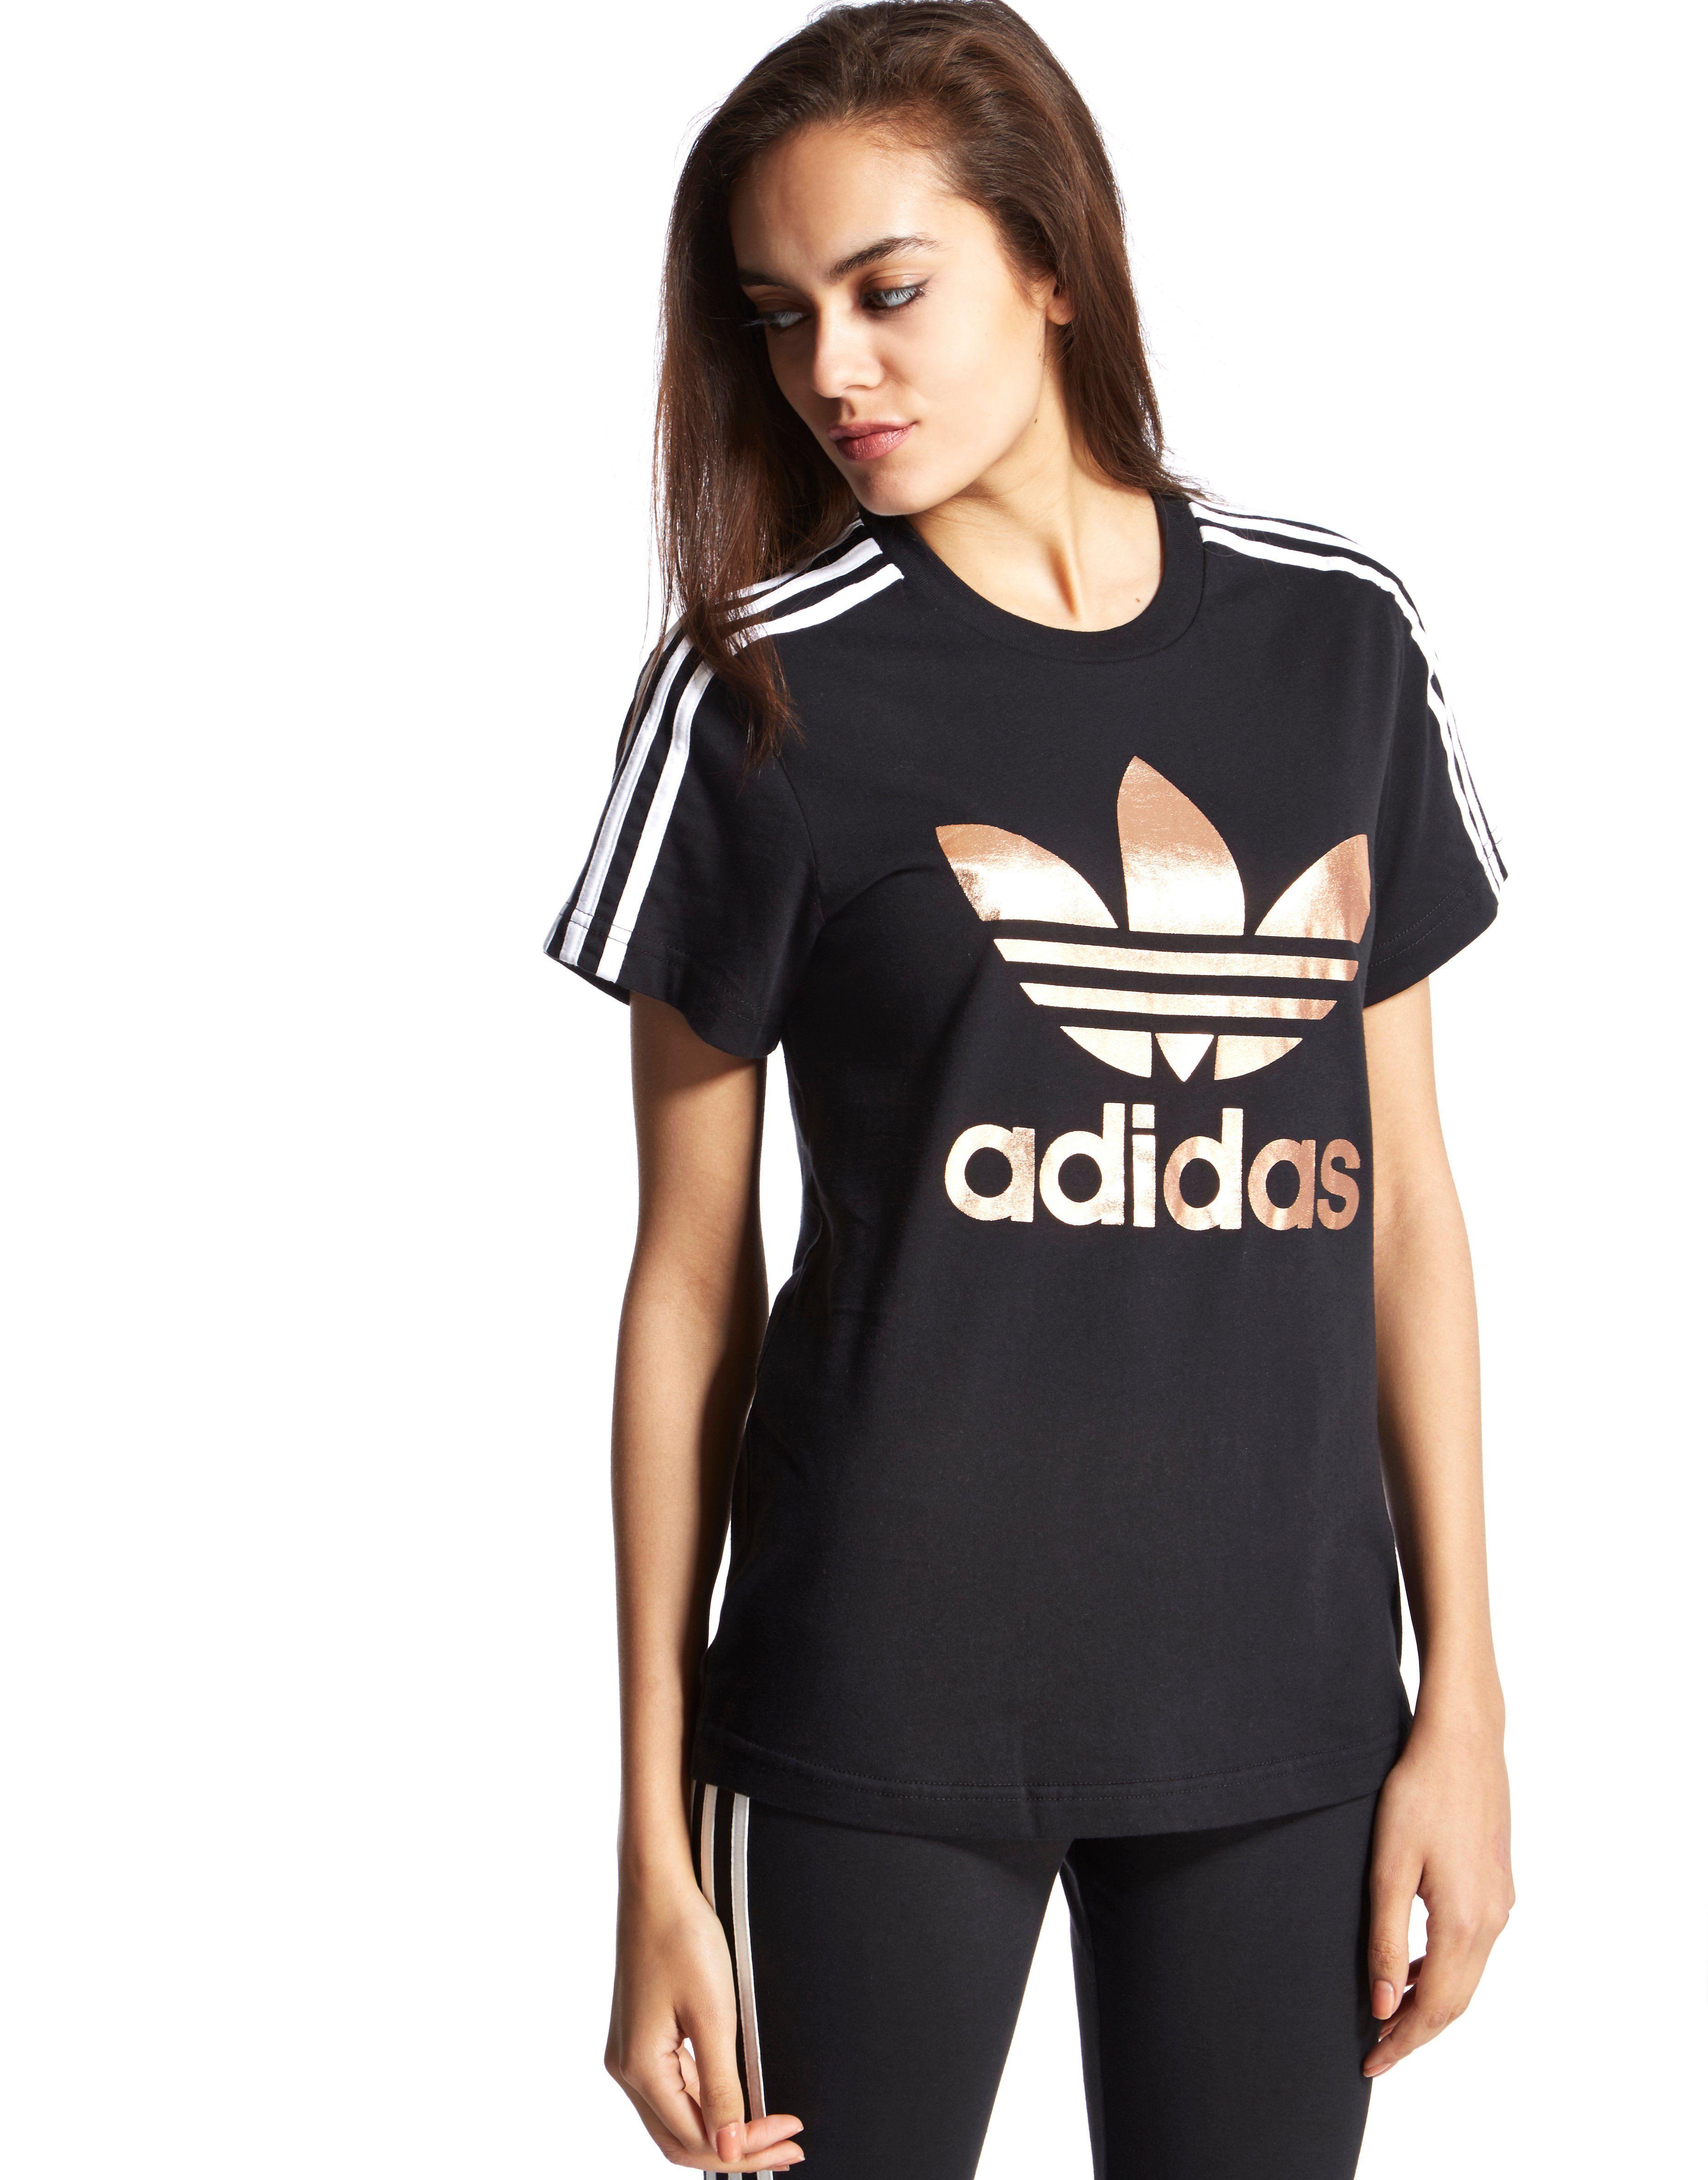 adidas originals 3 stripes trefoil t shirt jd sports